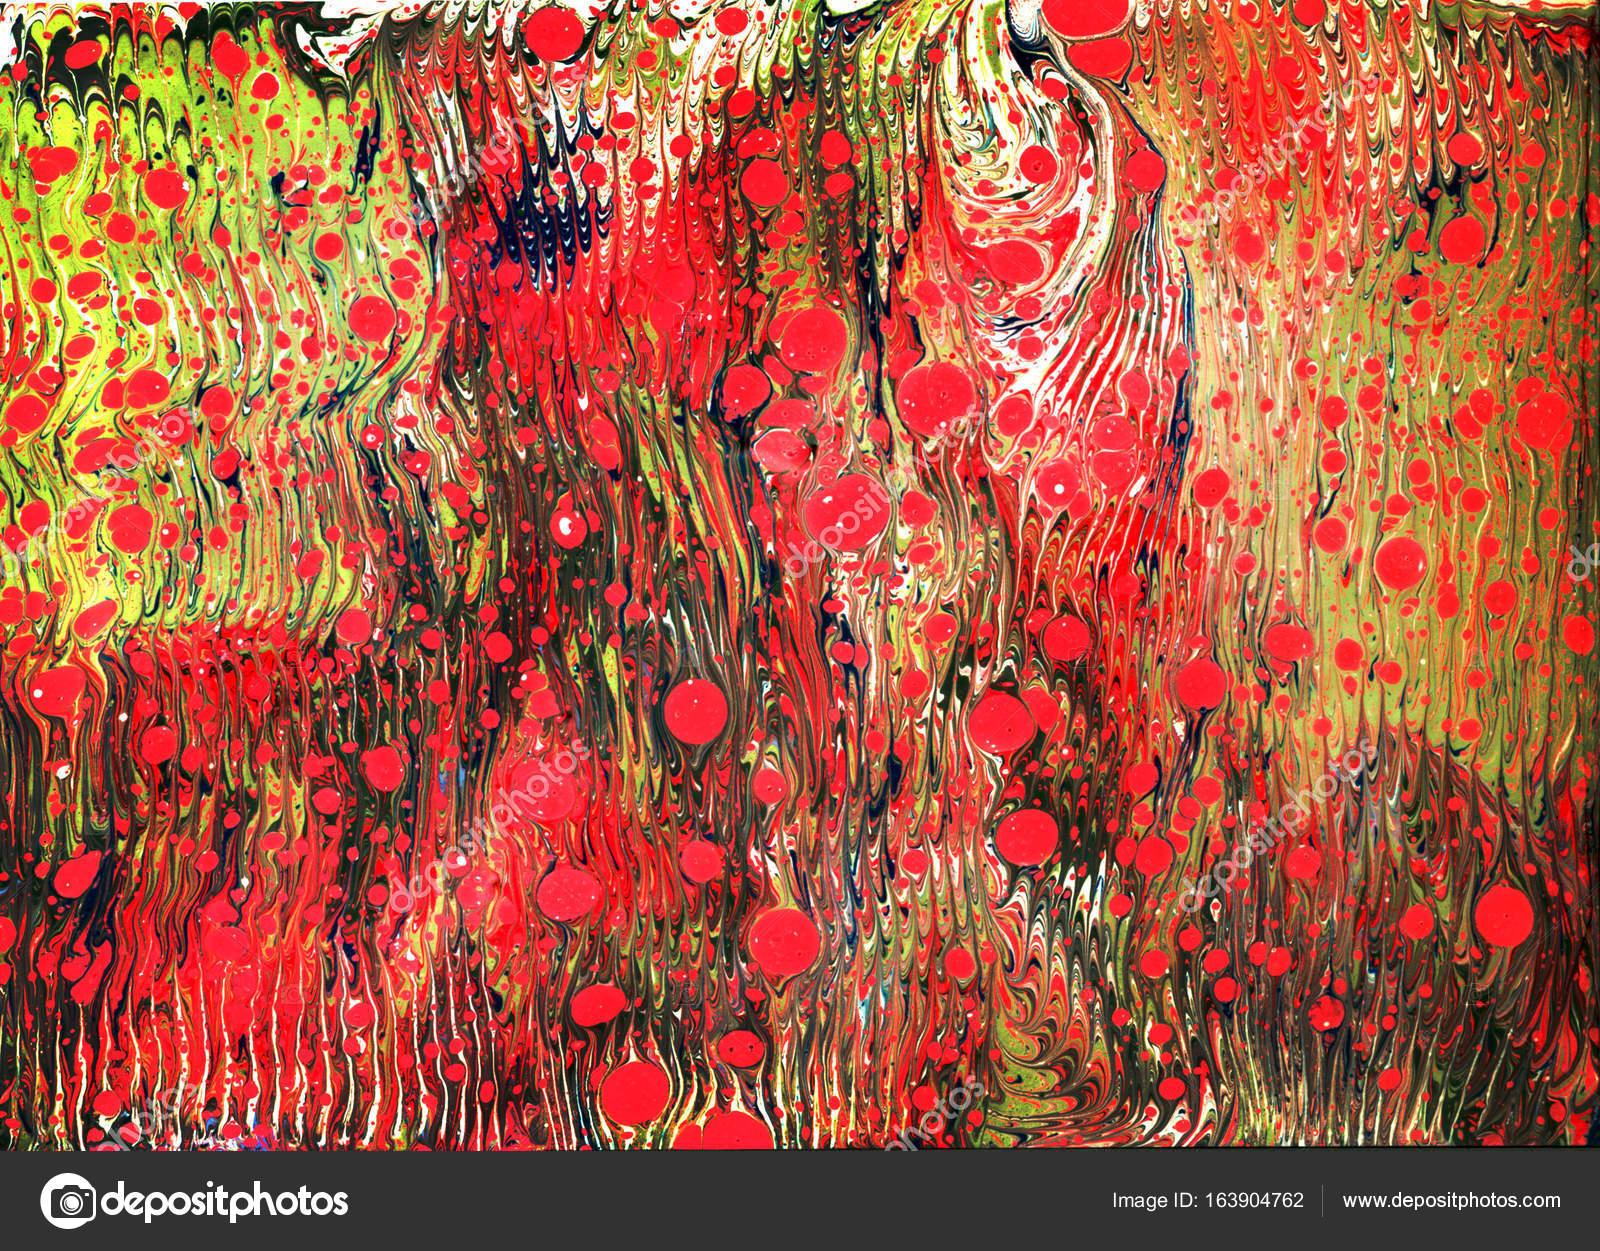 Most Inspiring Wallpaper Marble Paper - depositphotos_163904762-stock-photo-pink-marble-paper-wallpaper  Pictures_489688.jpg